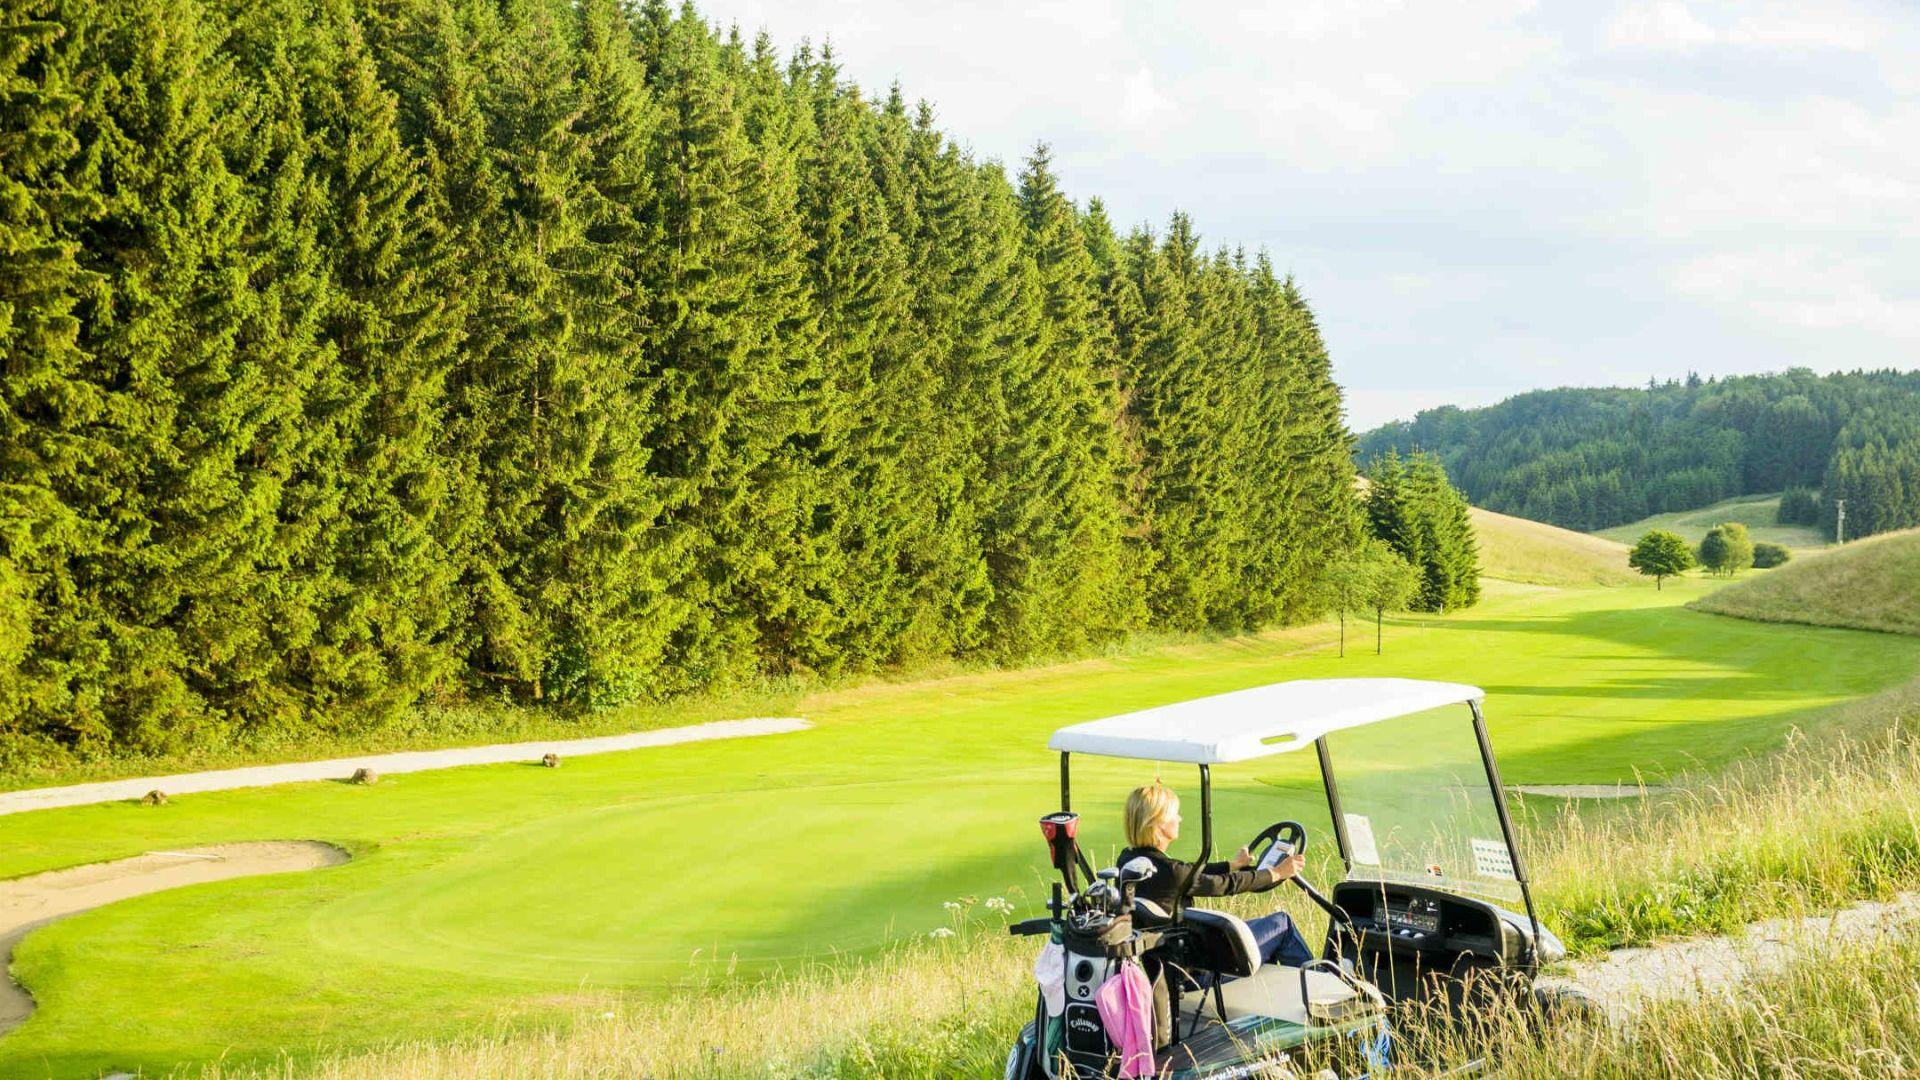 Golfplatz in Sonnenbühl-Undingen